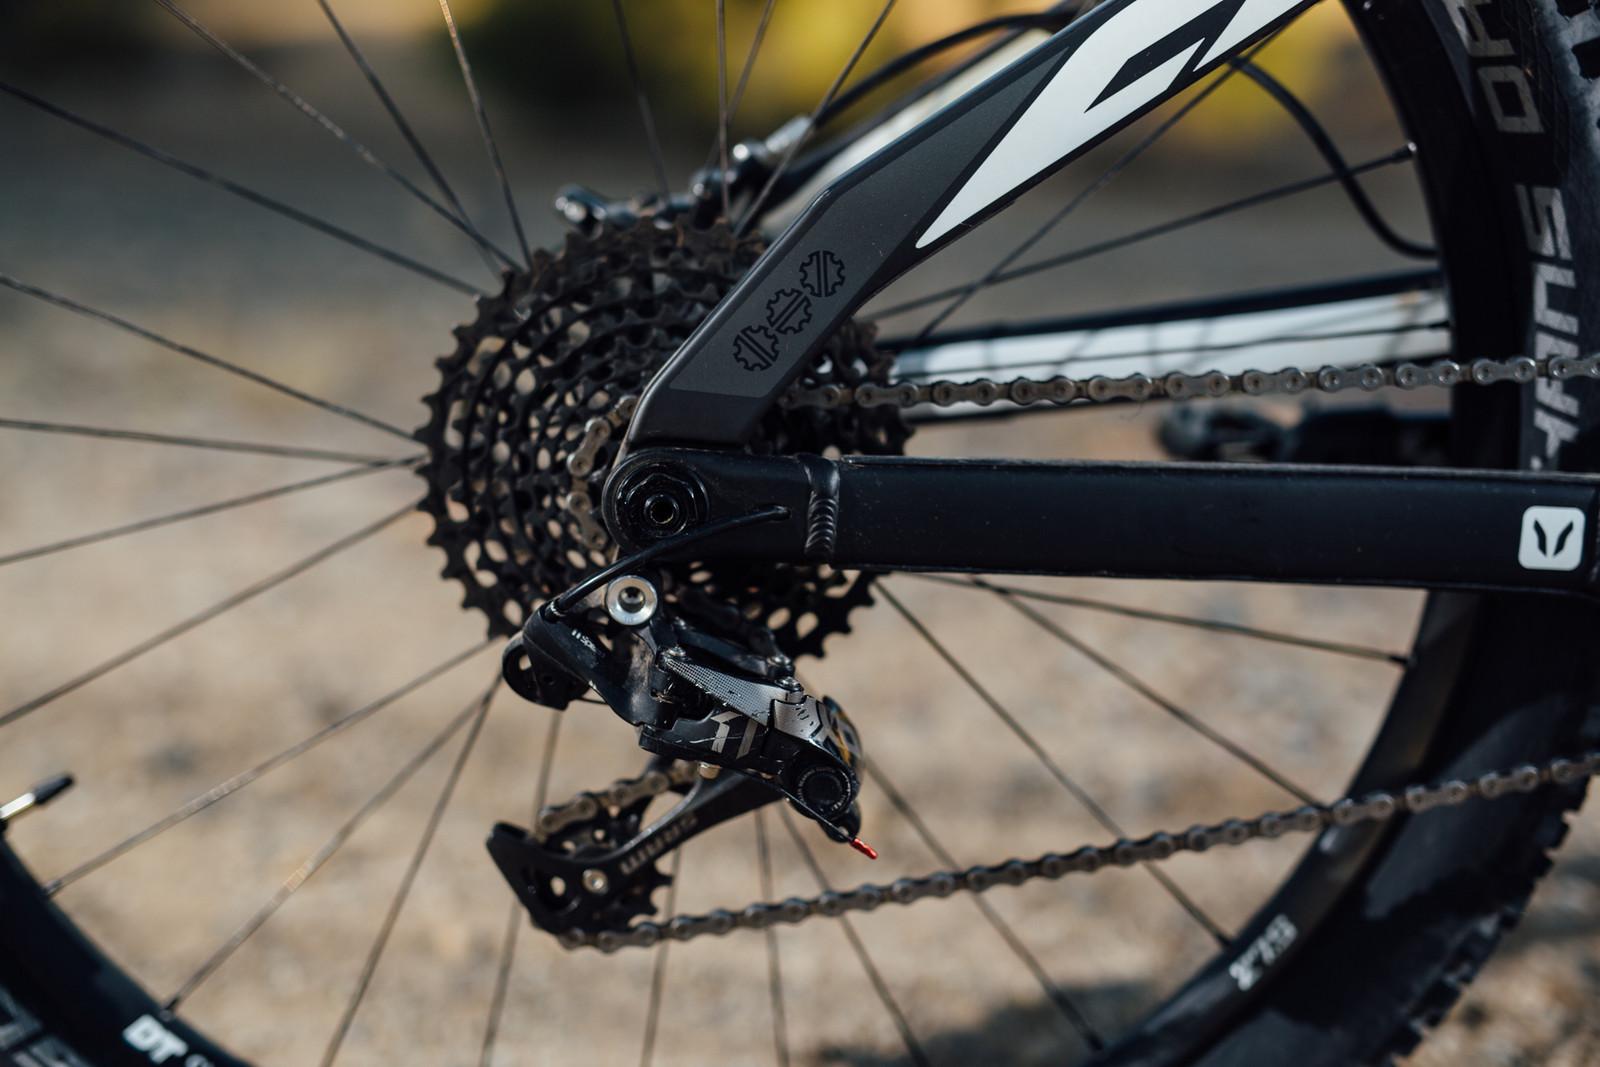 Devinci Troy Carbon RR - 2016 Vital MTB Test Sessions - Devinci Troy Carbon RR - 2016 Vital MTB Test Sessions - Mountain Biking Pictures - Vital MTB